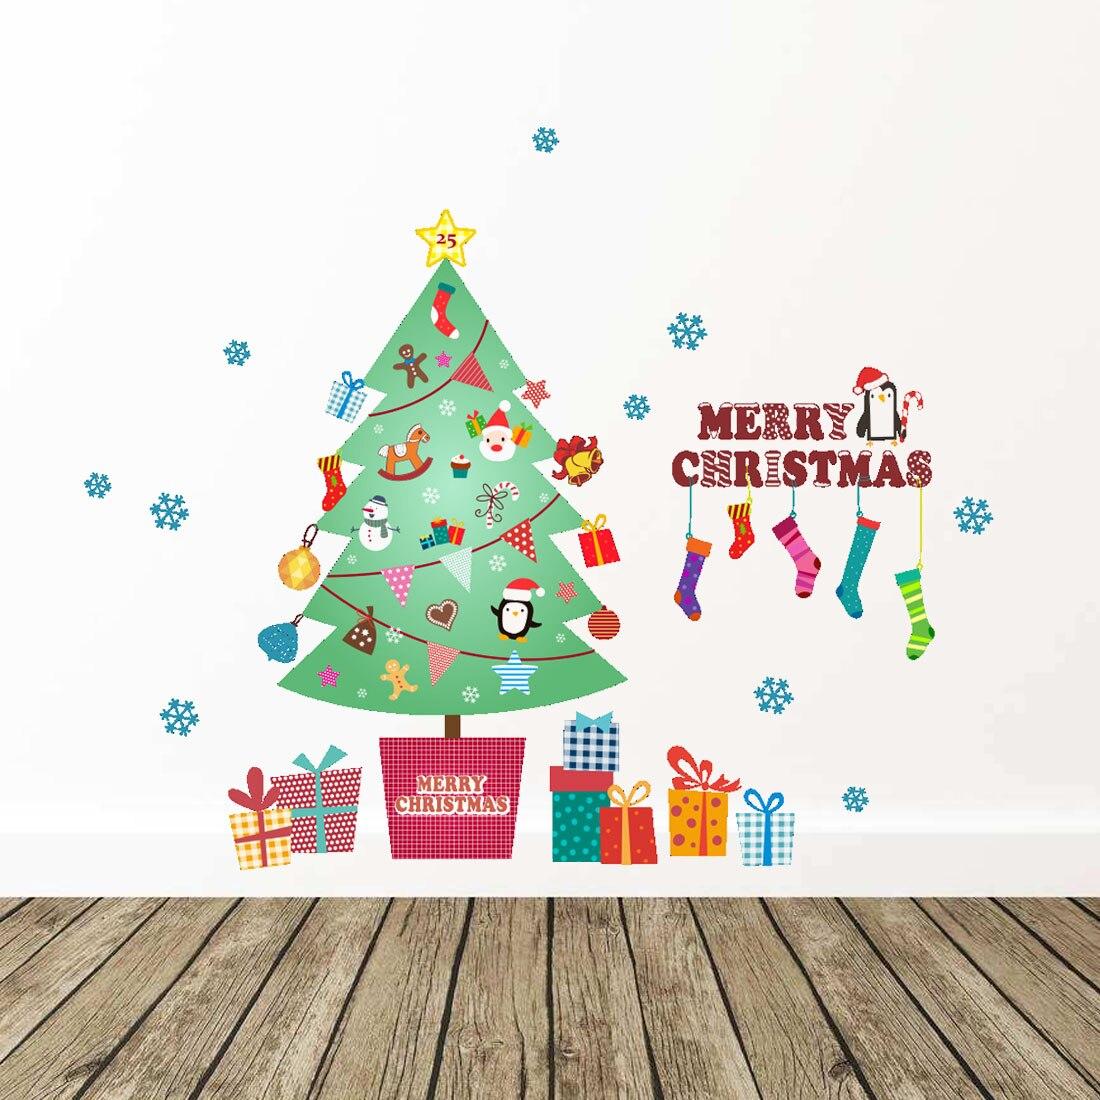 Good Xmas tree Wall Stickers 2018 Happy New Year Merry Christmas Wall Sticker Xmas Home Shop Windows Decals Decor